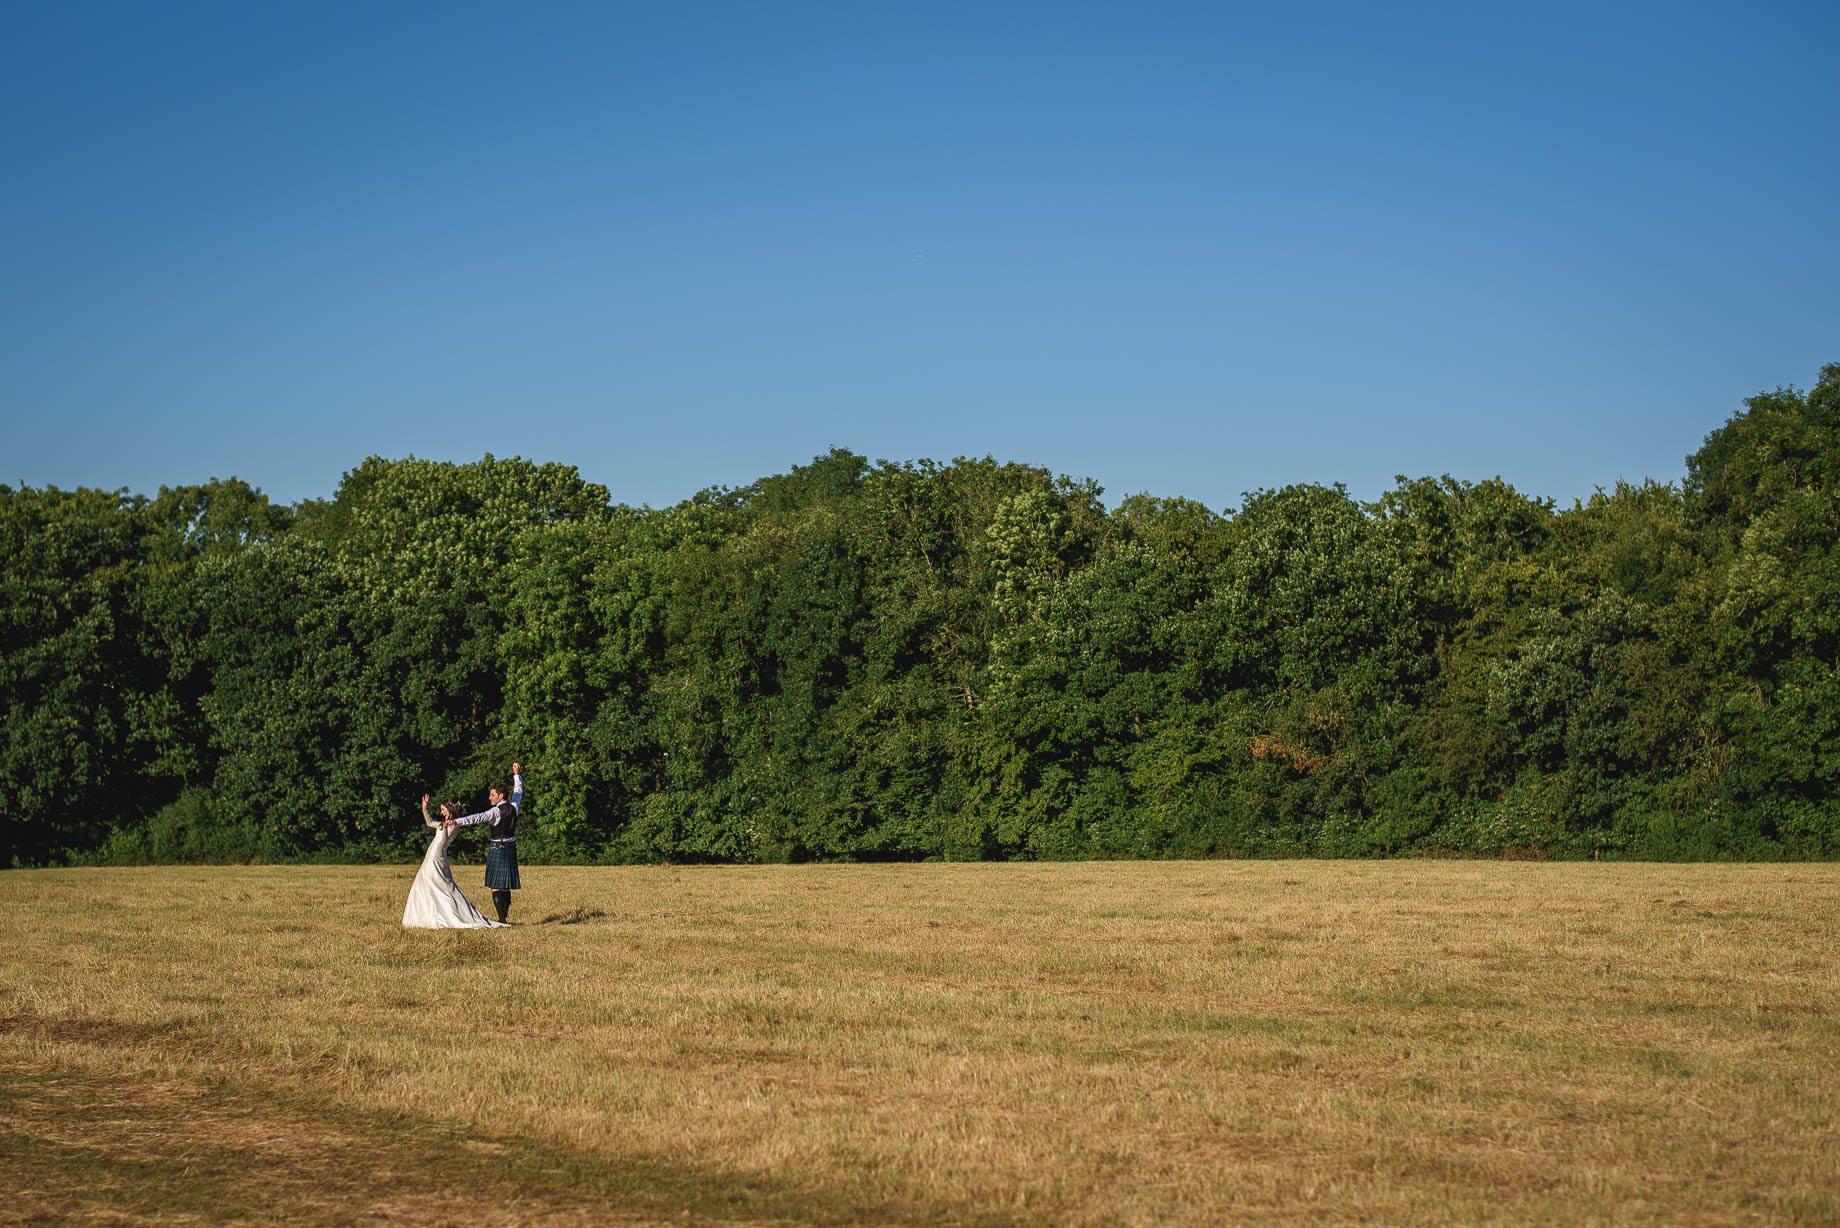 Gildings Barn wedding photography - Sarah and Steve (149 of 190)